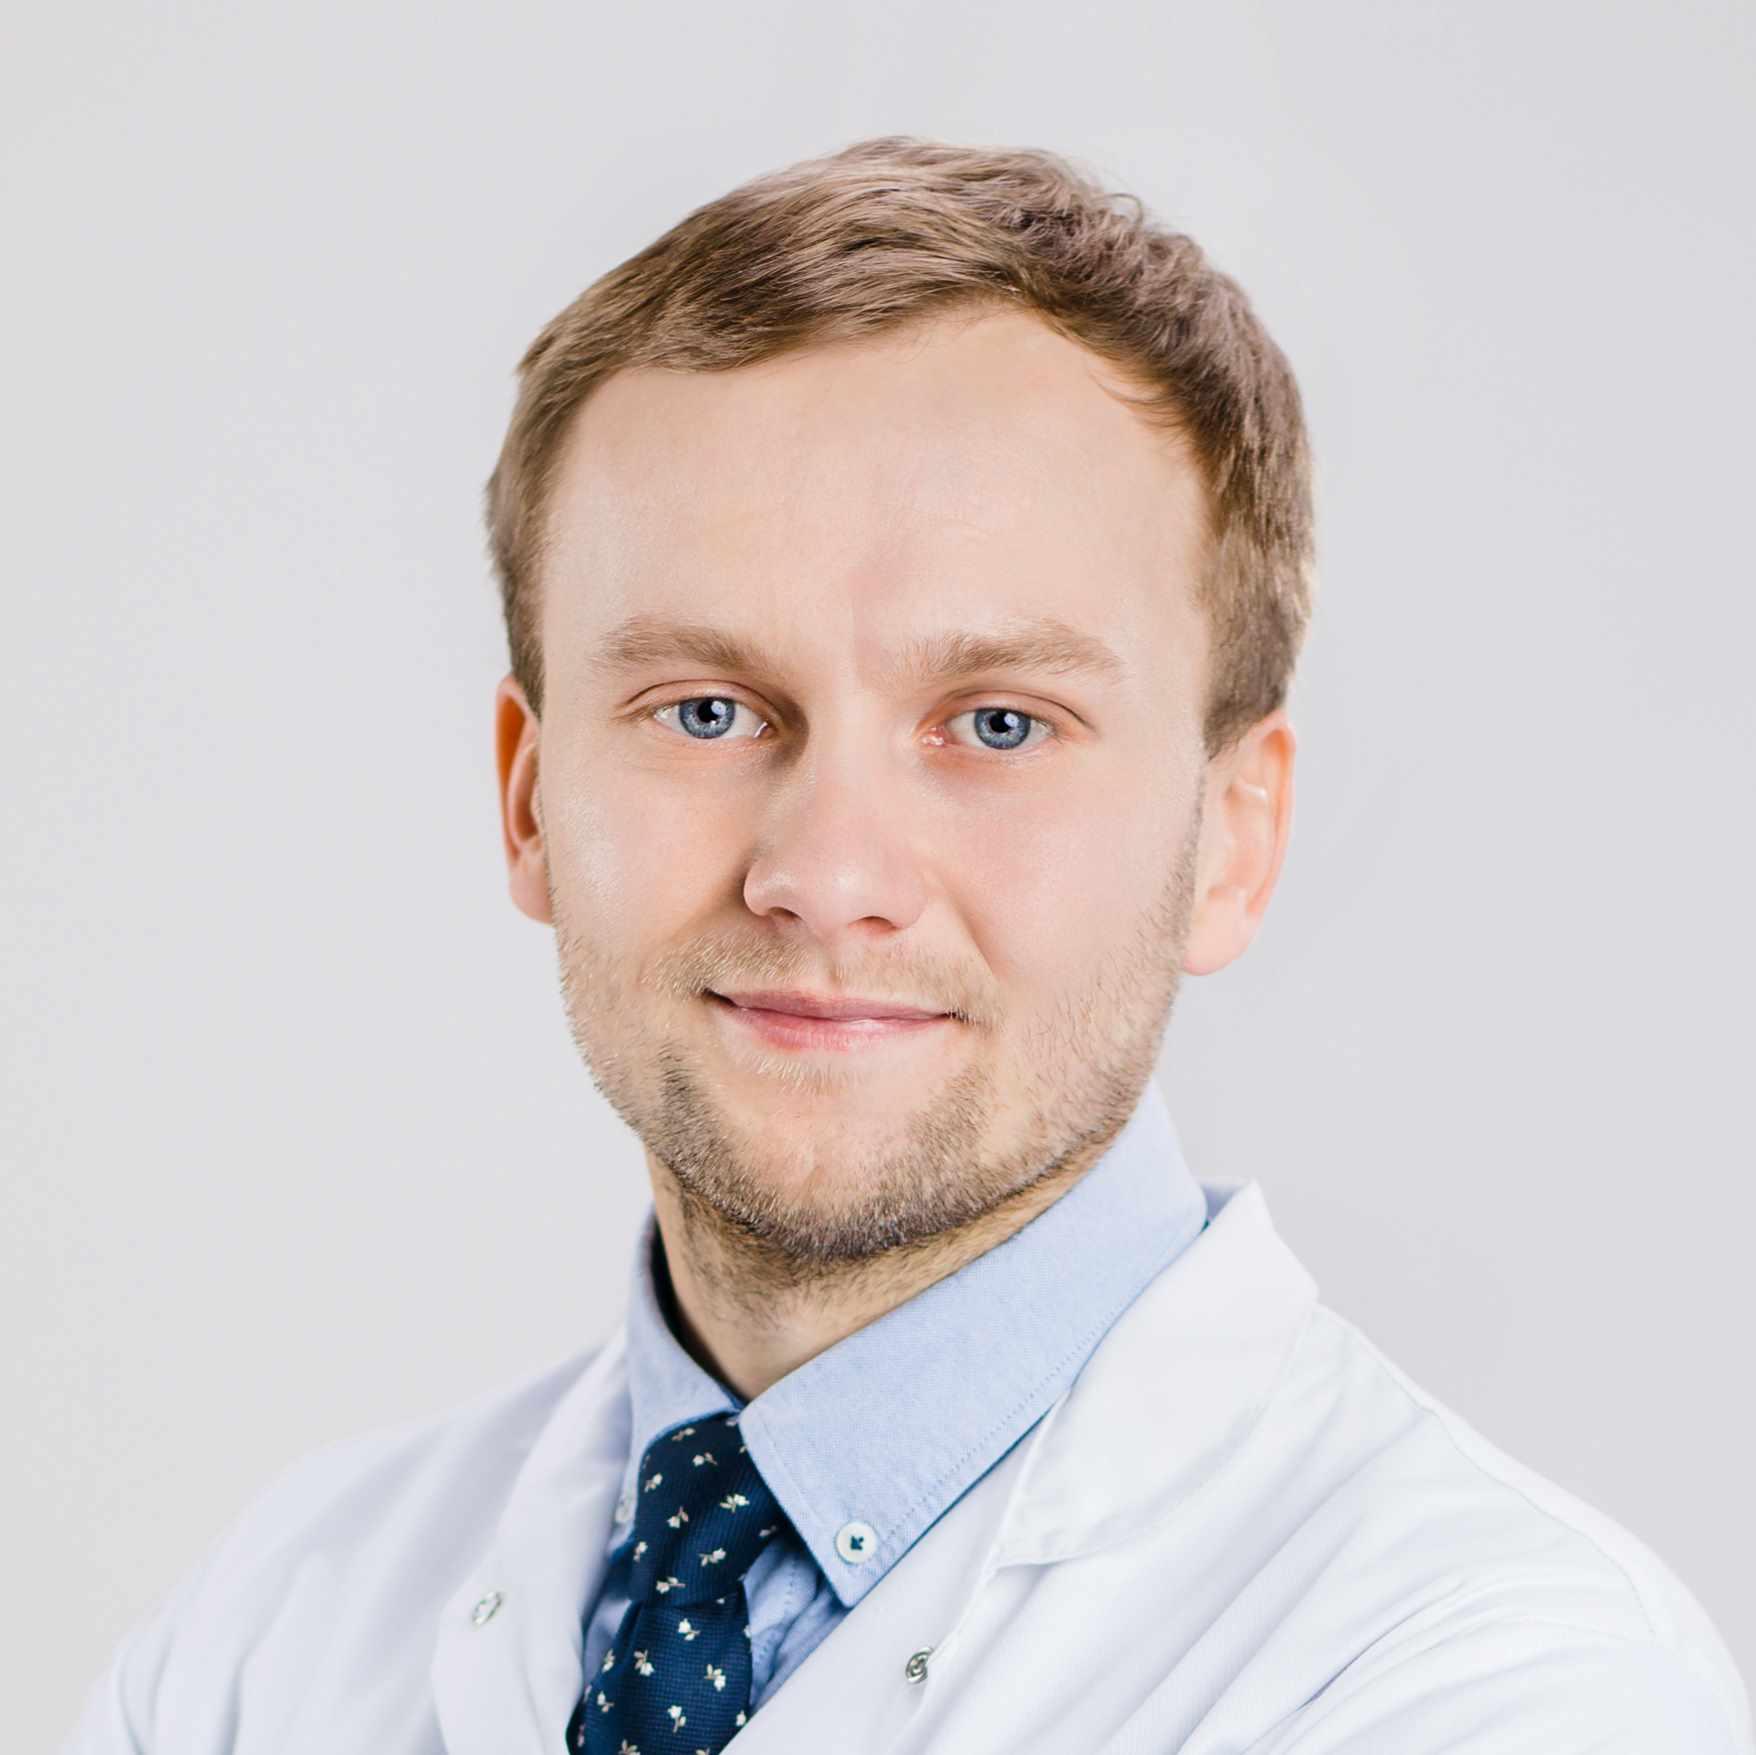 Oculomedica - Dr Paweł Reisner